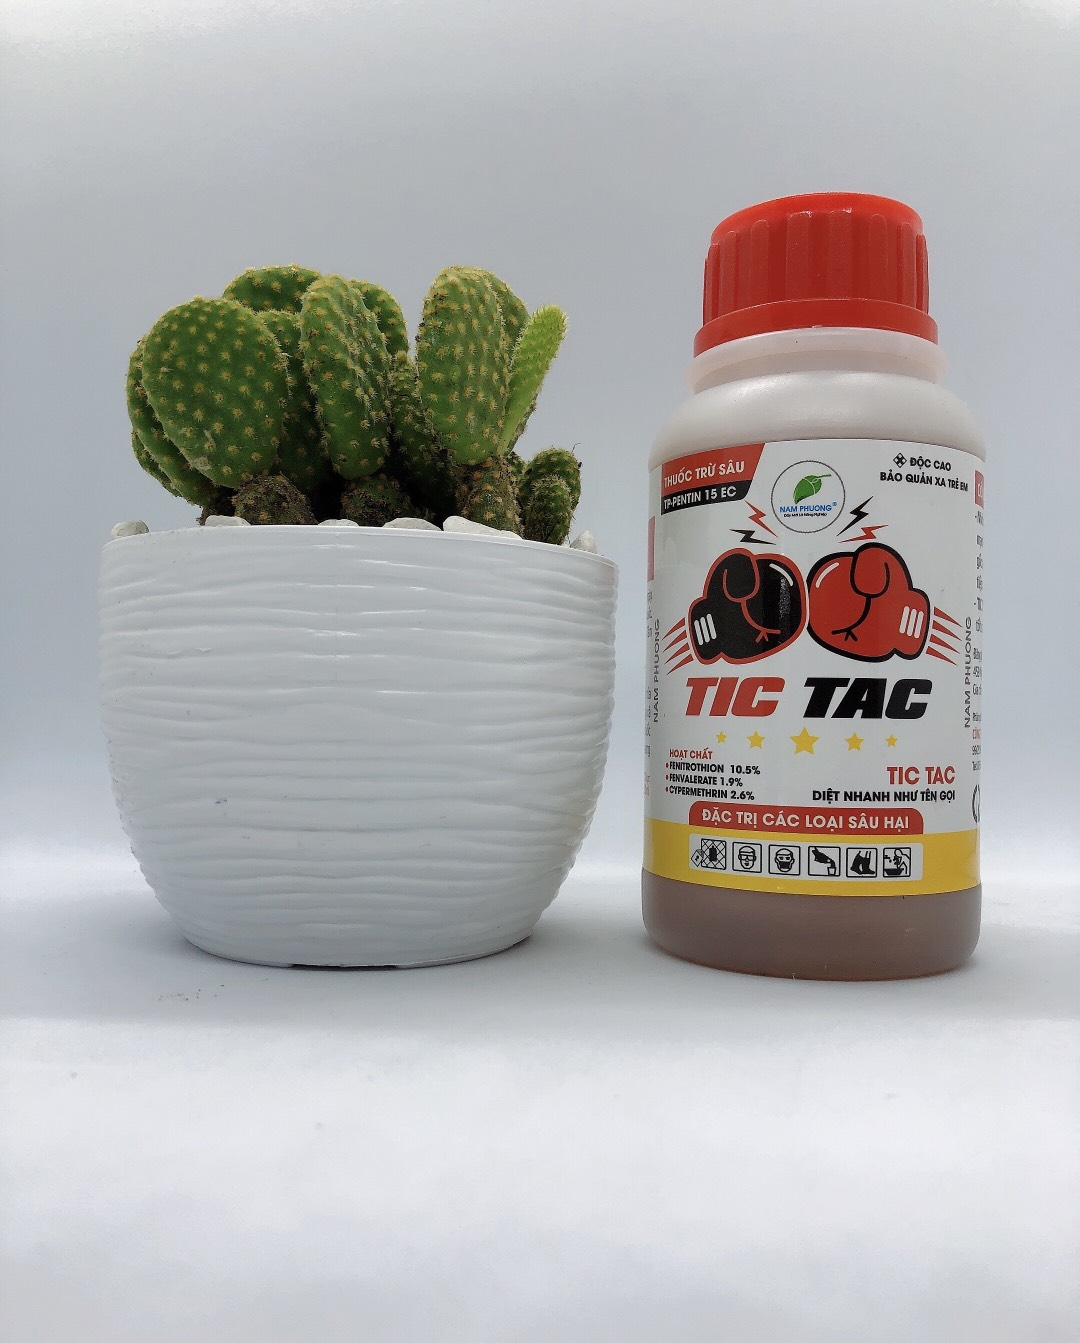 tic-tac-250-thuoc-dac-tri-rep-sap-trang